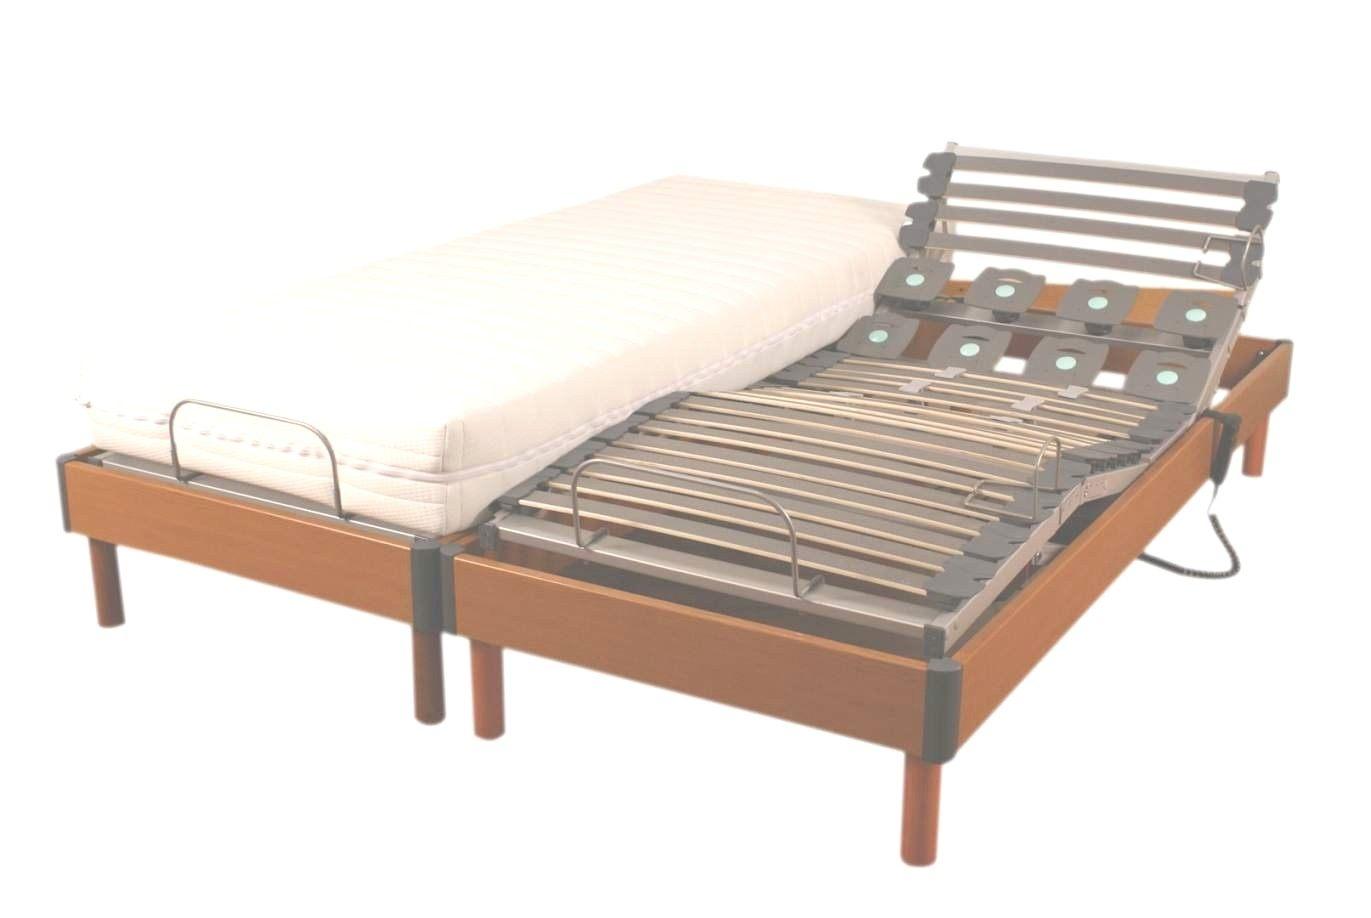 Lit Rond Ikea Sultan Frais Ikealit Fabulous Ikea Matras Hovag Better Ikea Lit Ikea Bed Box